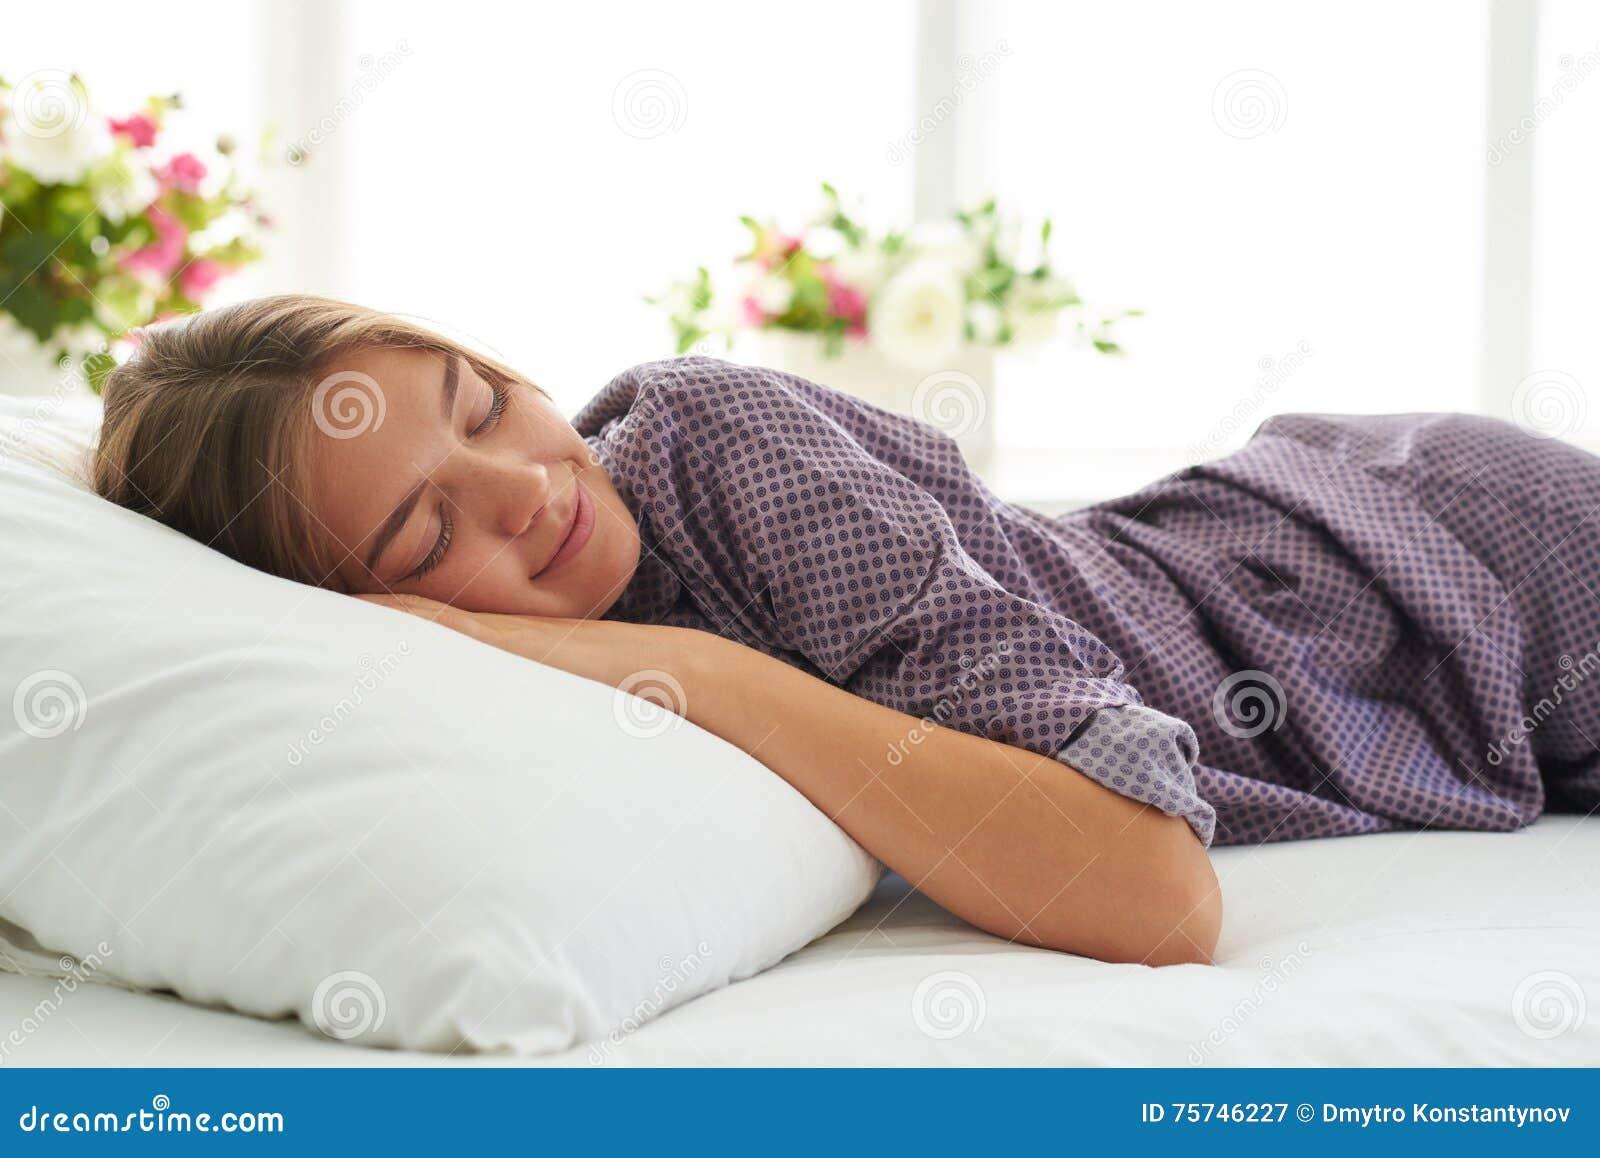 How You Choose Your Pajamas to Sleep